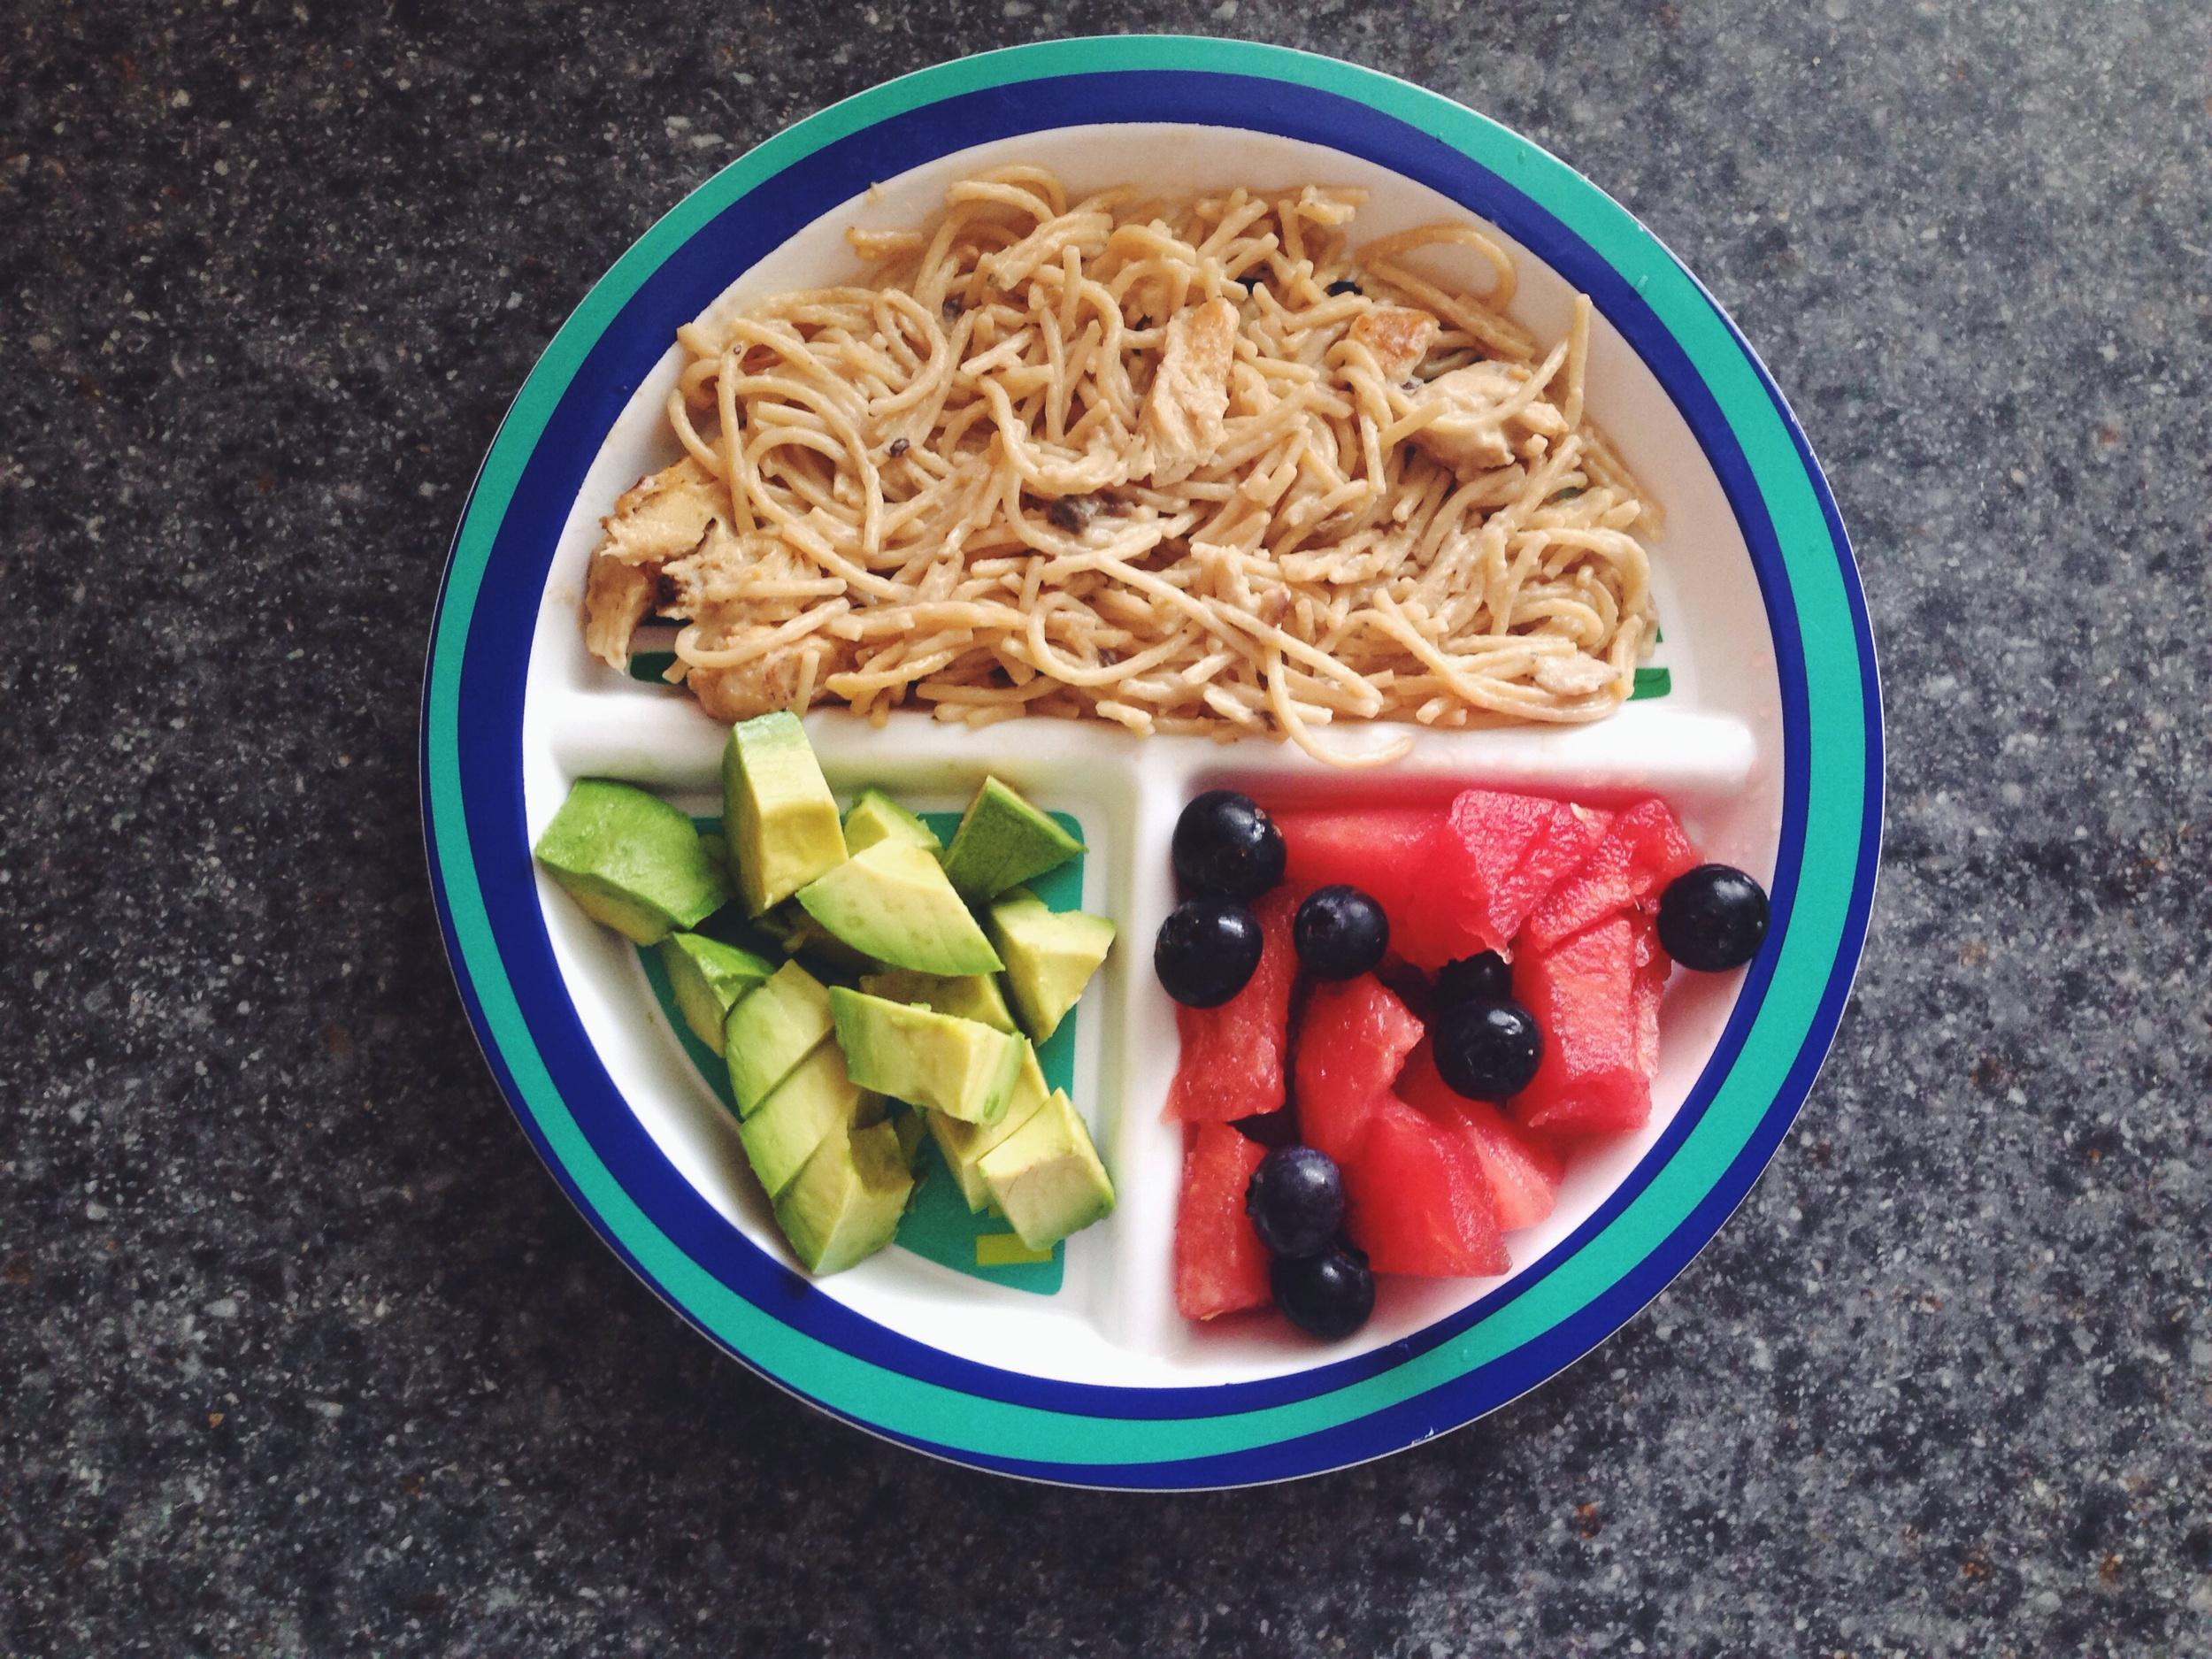 whole wheat pasta, grilled chicken, mushroom Alfredo sauce / watermelon, blueberries / avocado slices